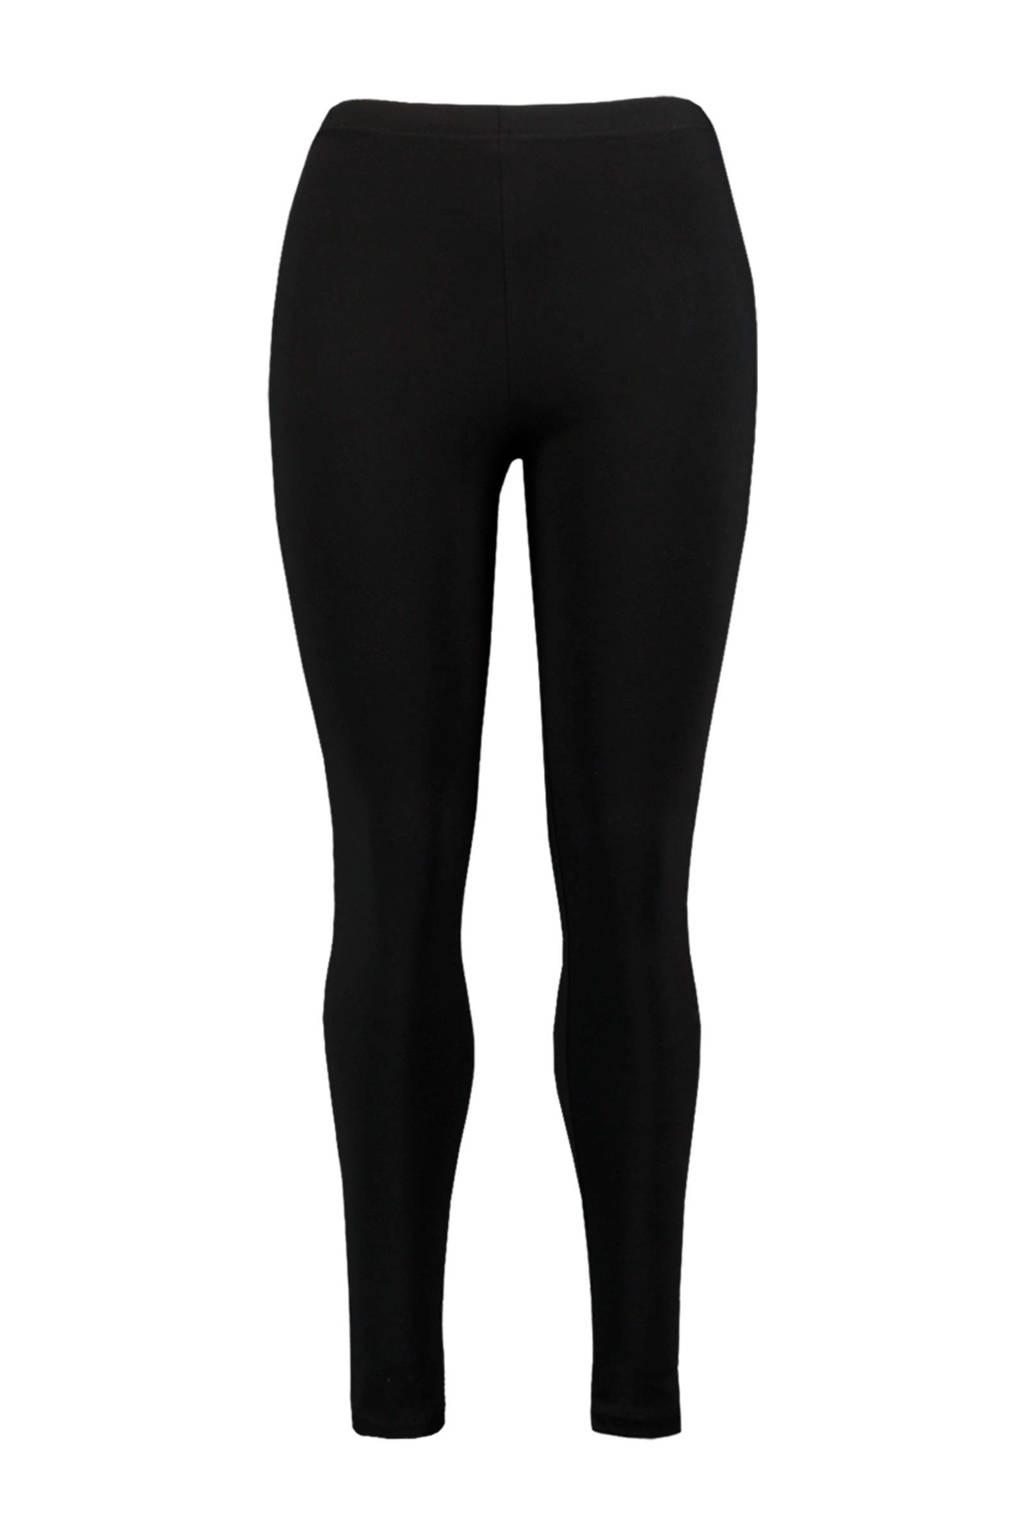 MS Mode legging zwart - set van 2, Zwart